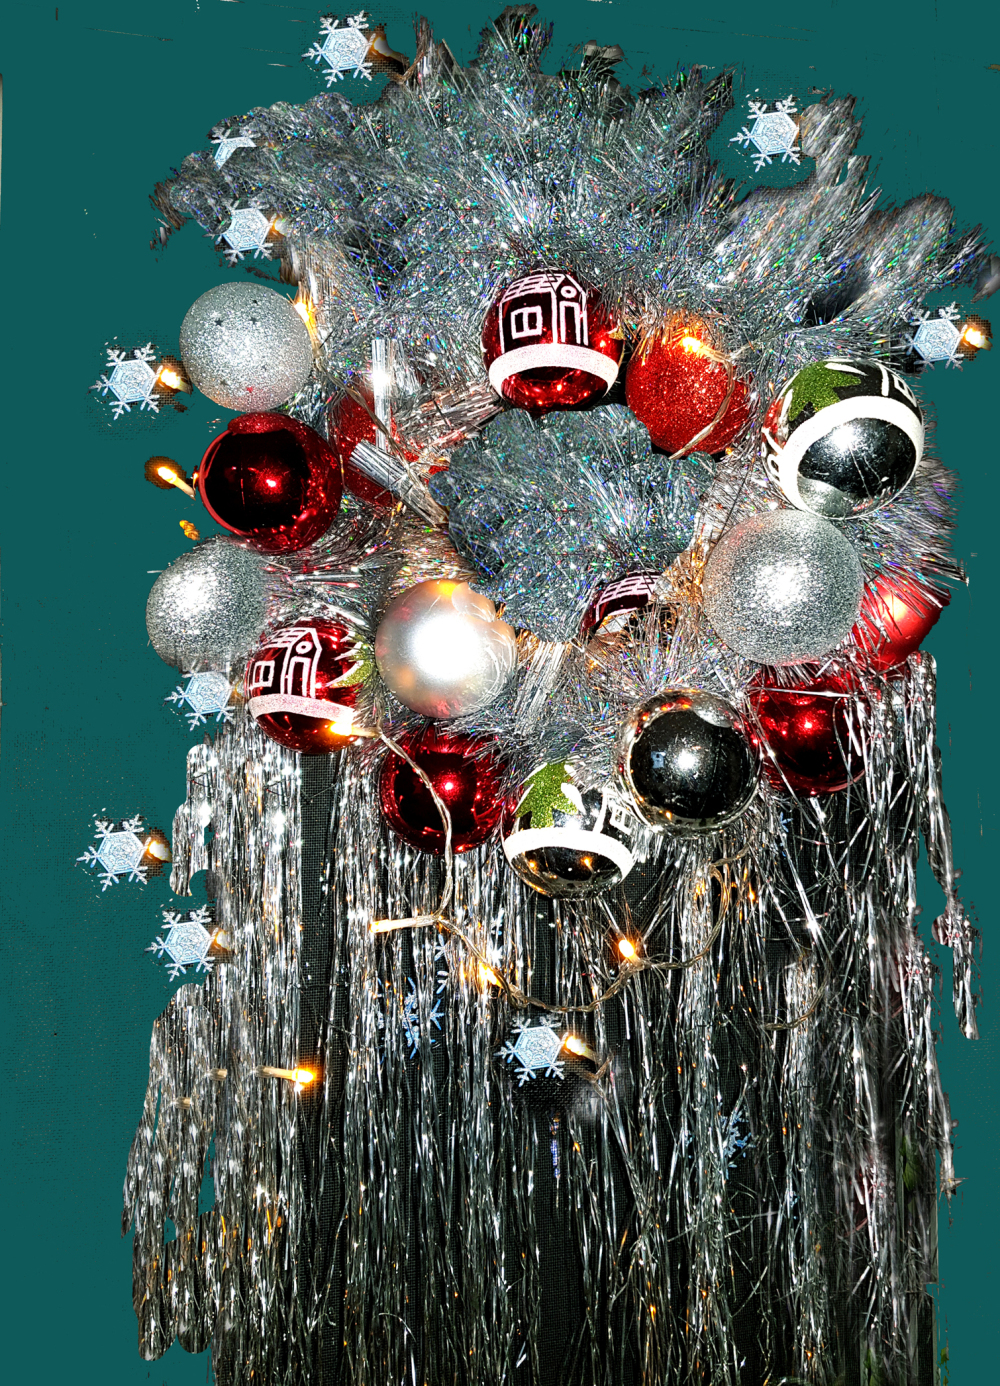 Advent 13 Christmas Deco Season